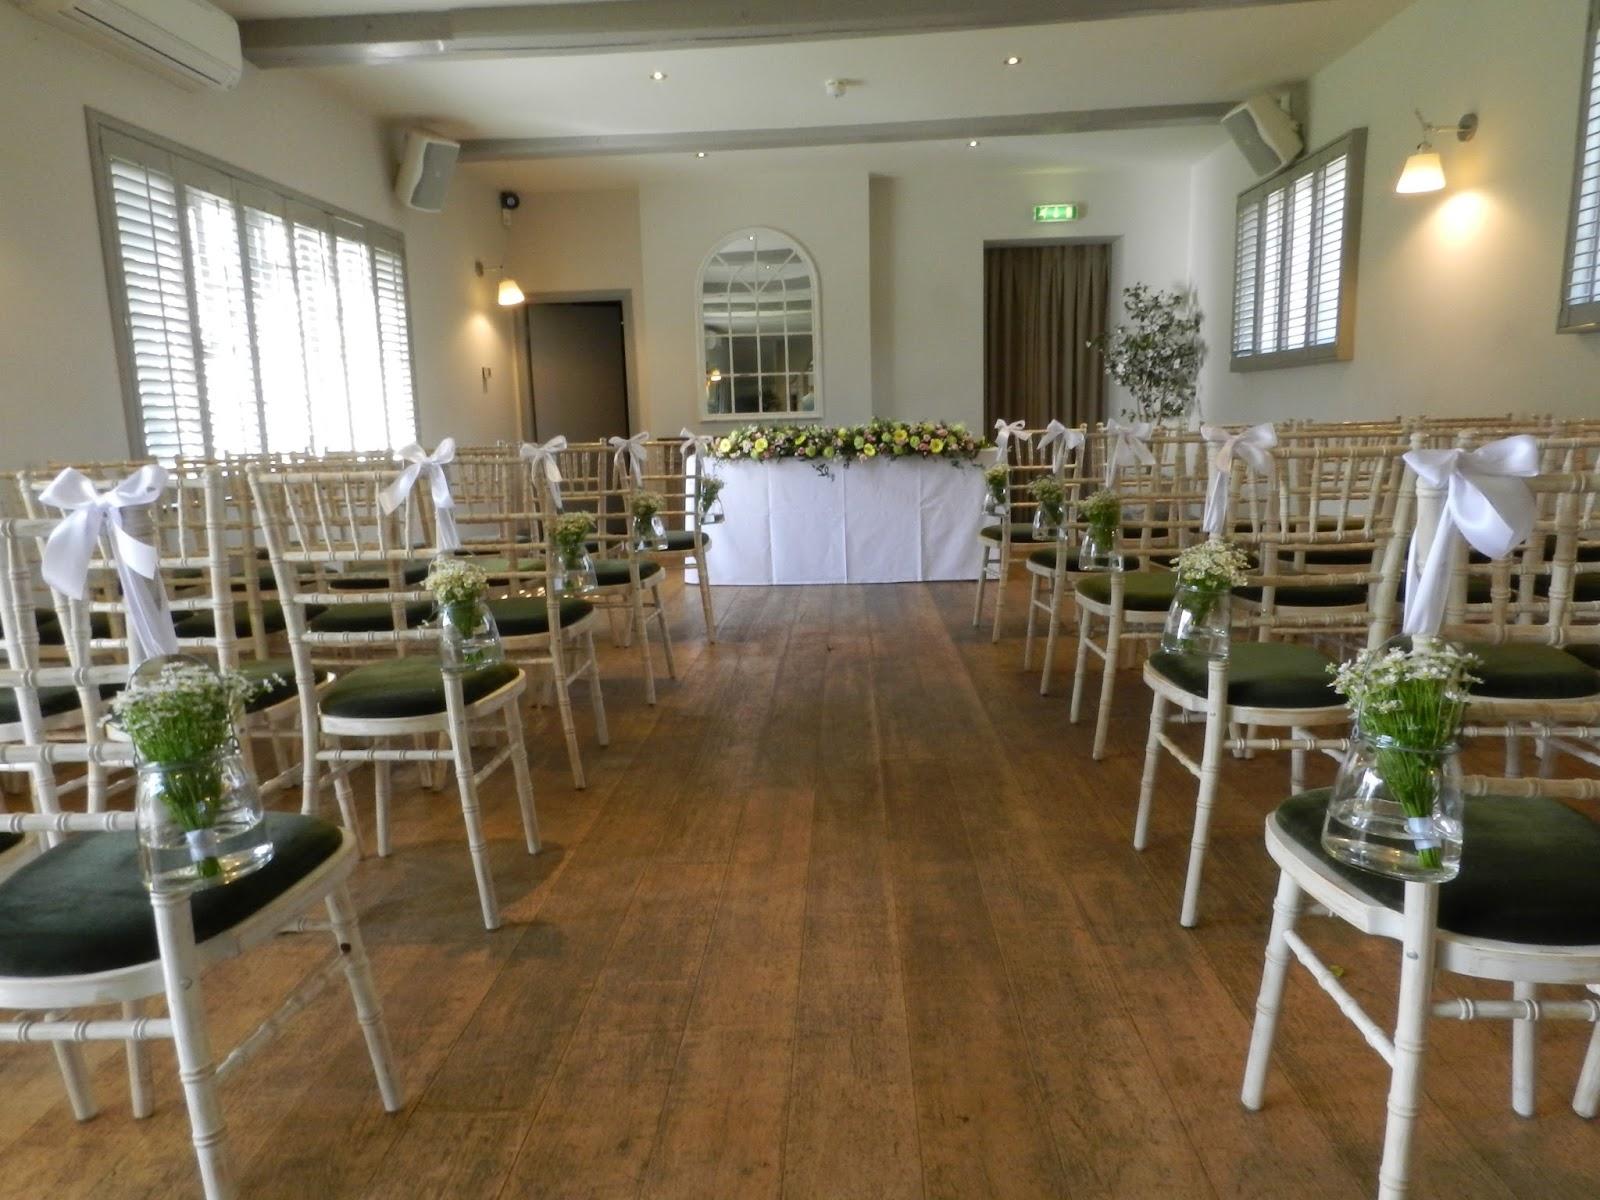 Sandra's Flower Studio: Doddington Hall Civil Ceremony And